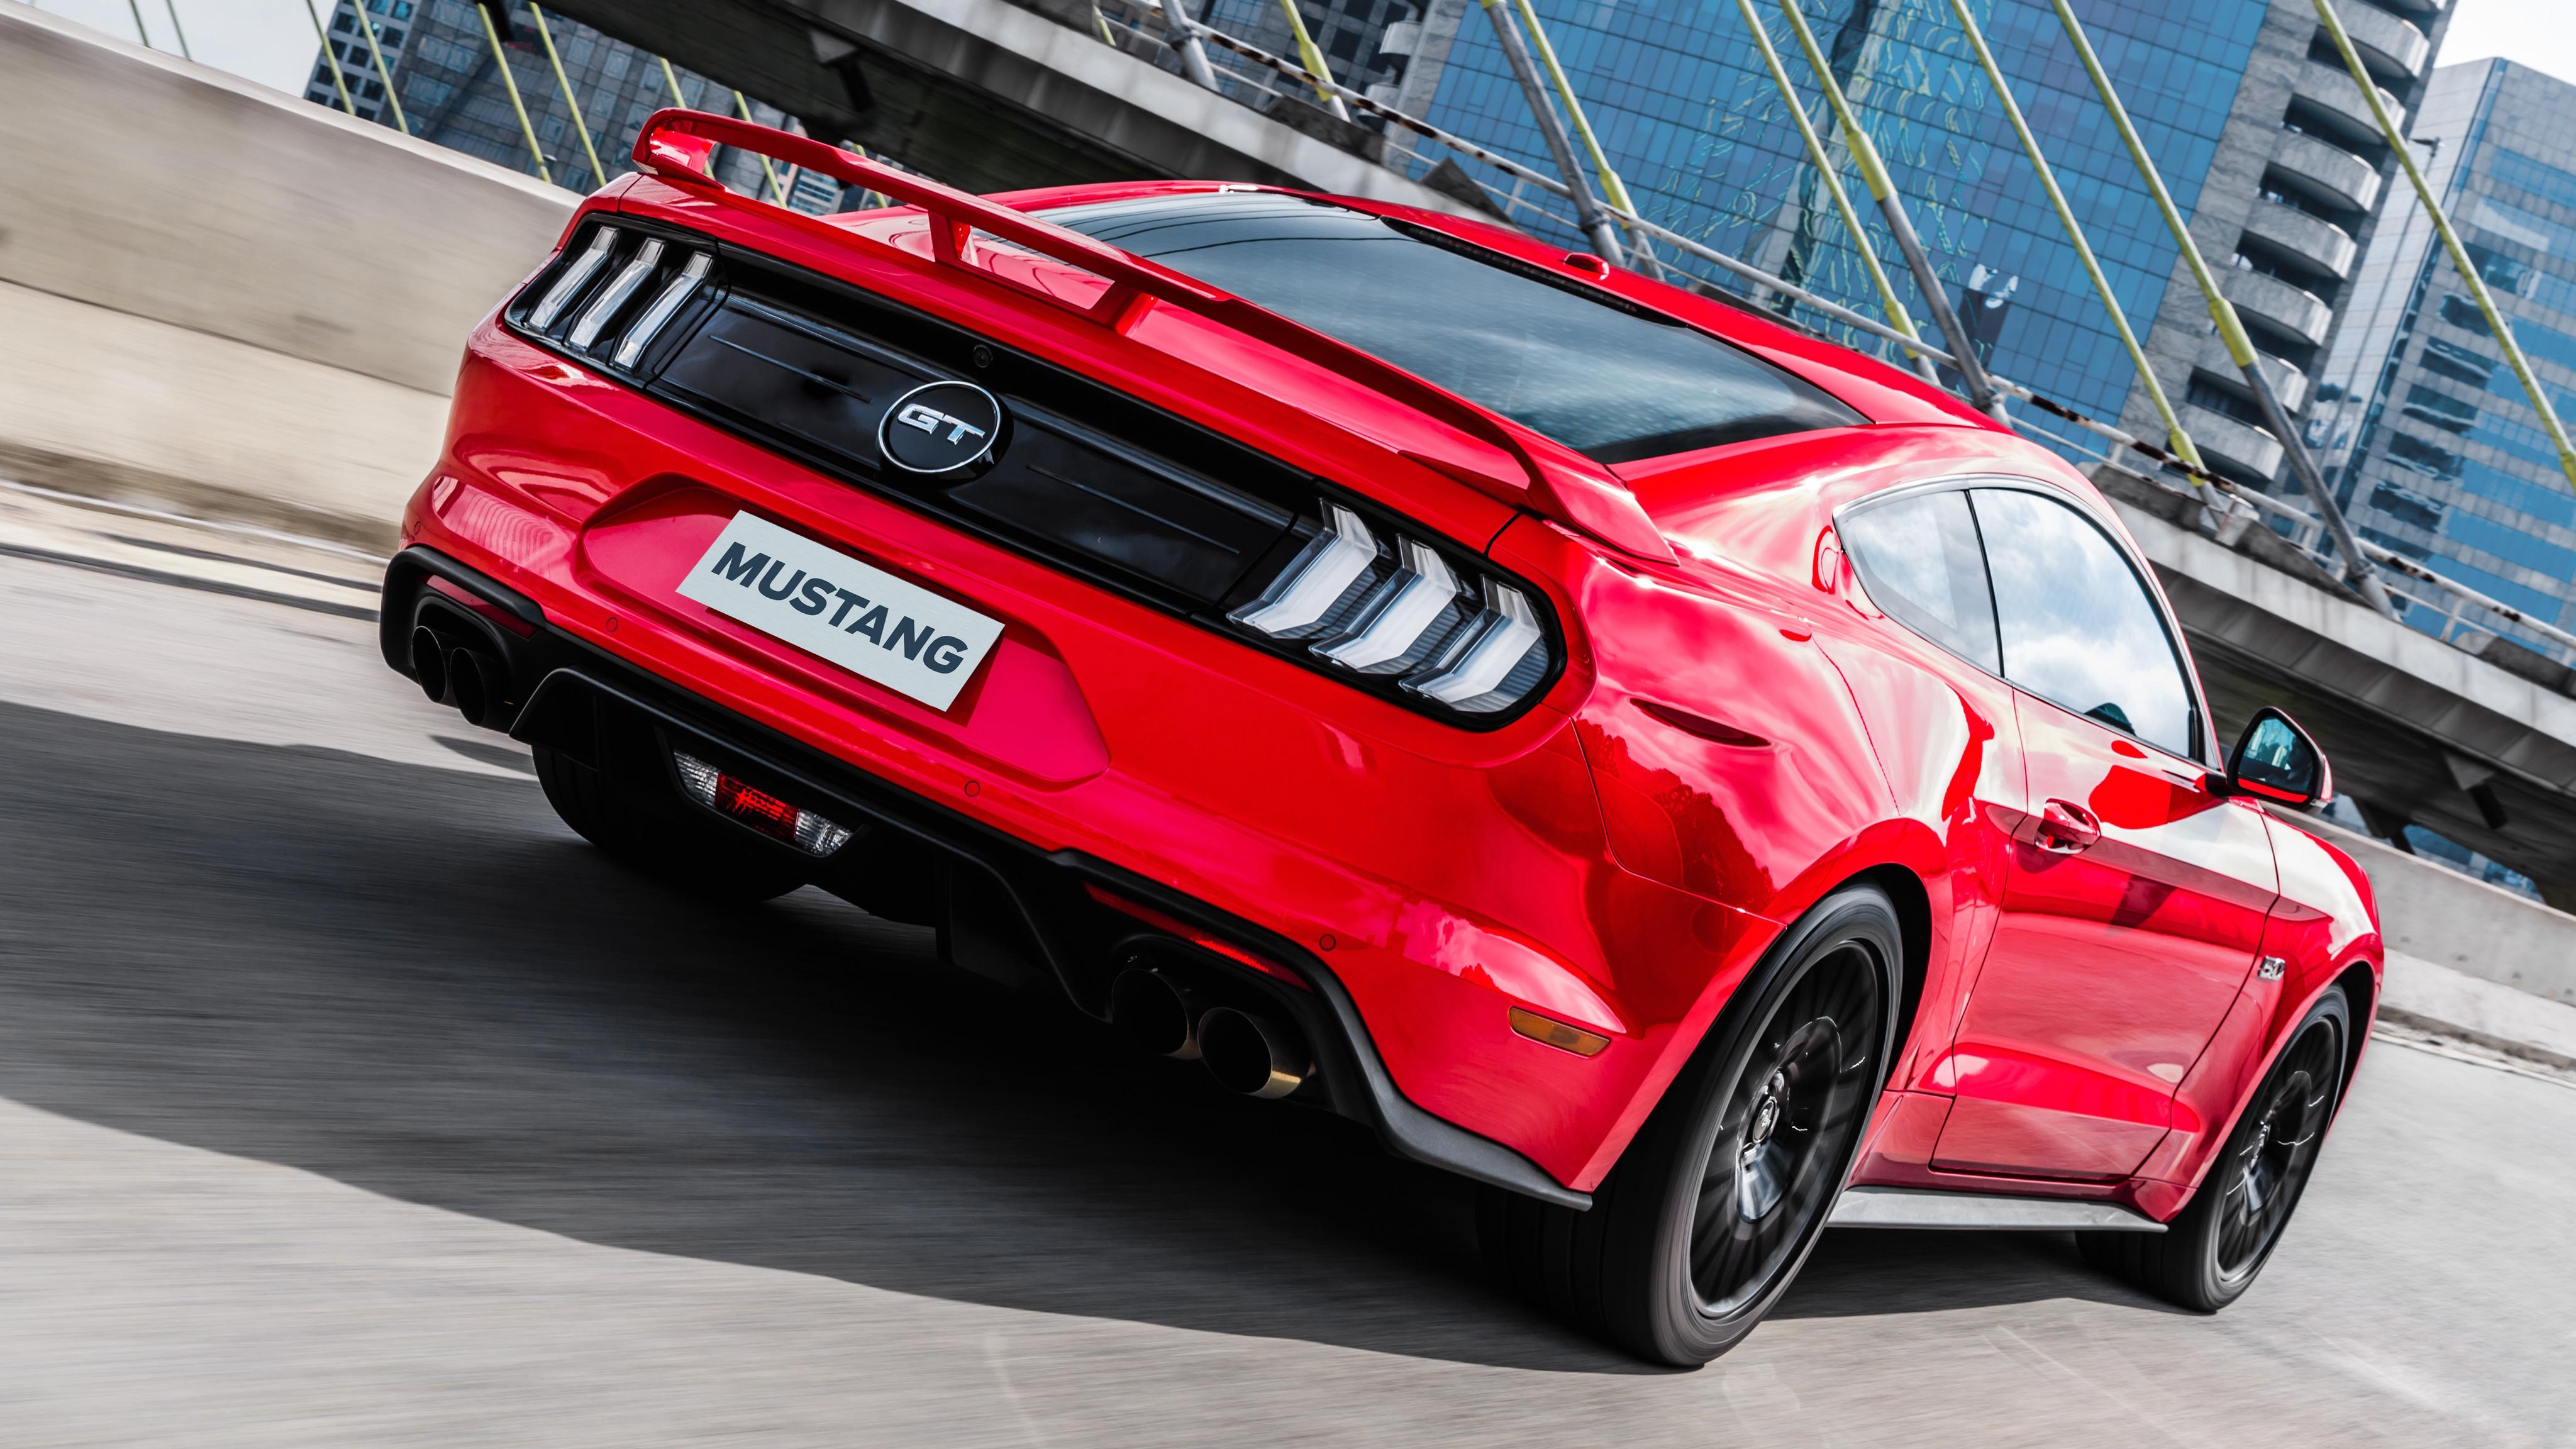 2018 Ford Mustang GT Fastback 4K 11 Wallpaper | HD Car ...